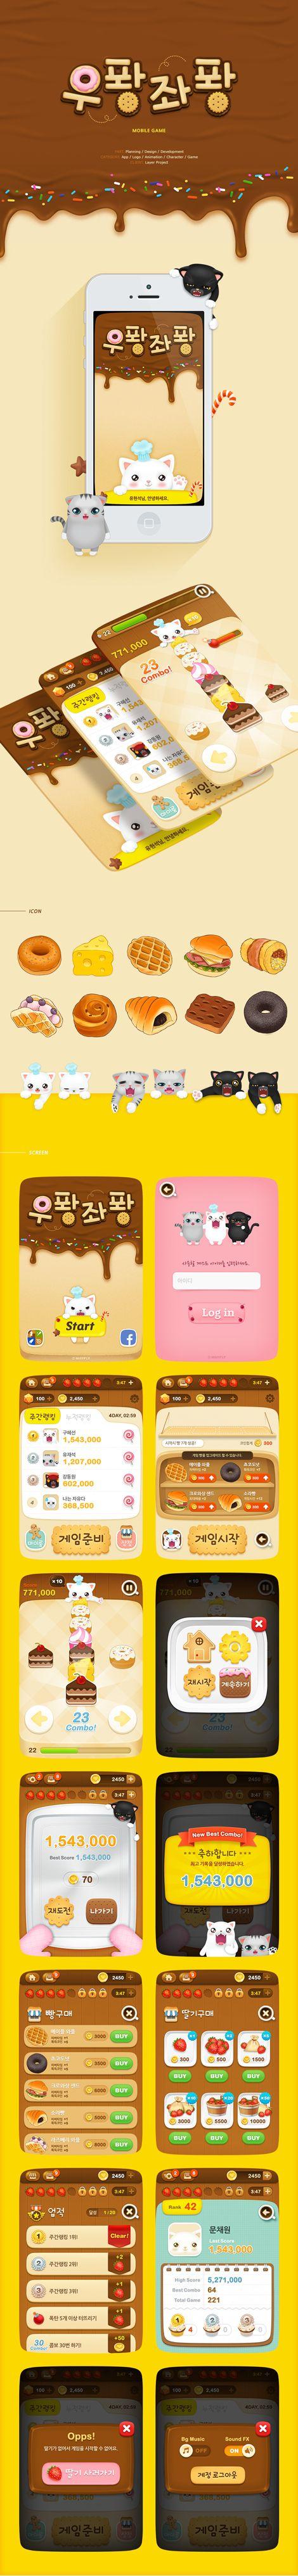 http://www.uxlayer.com/?portfolio=fhangfhang-app